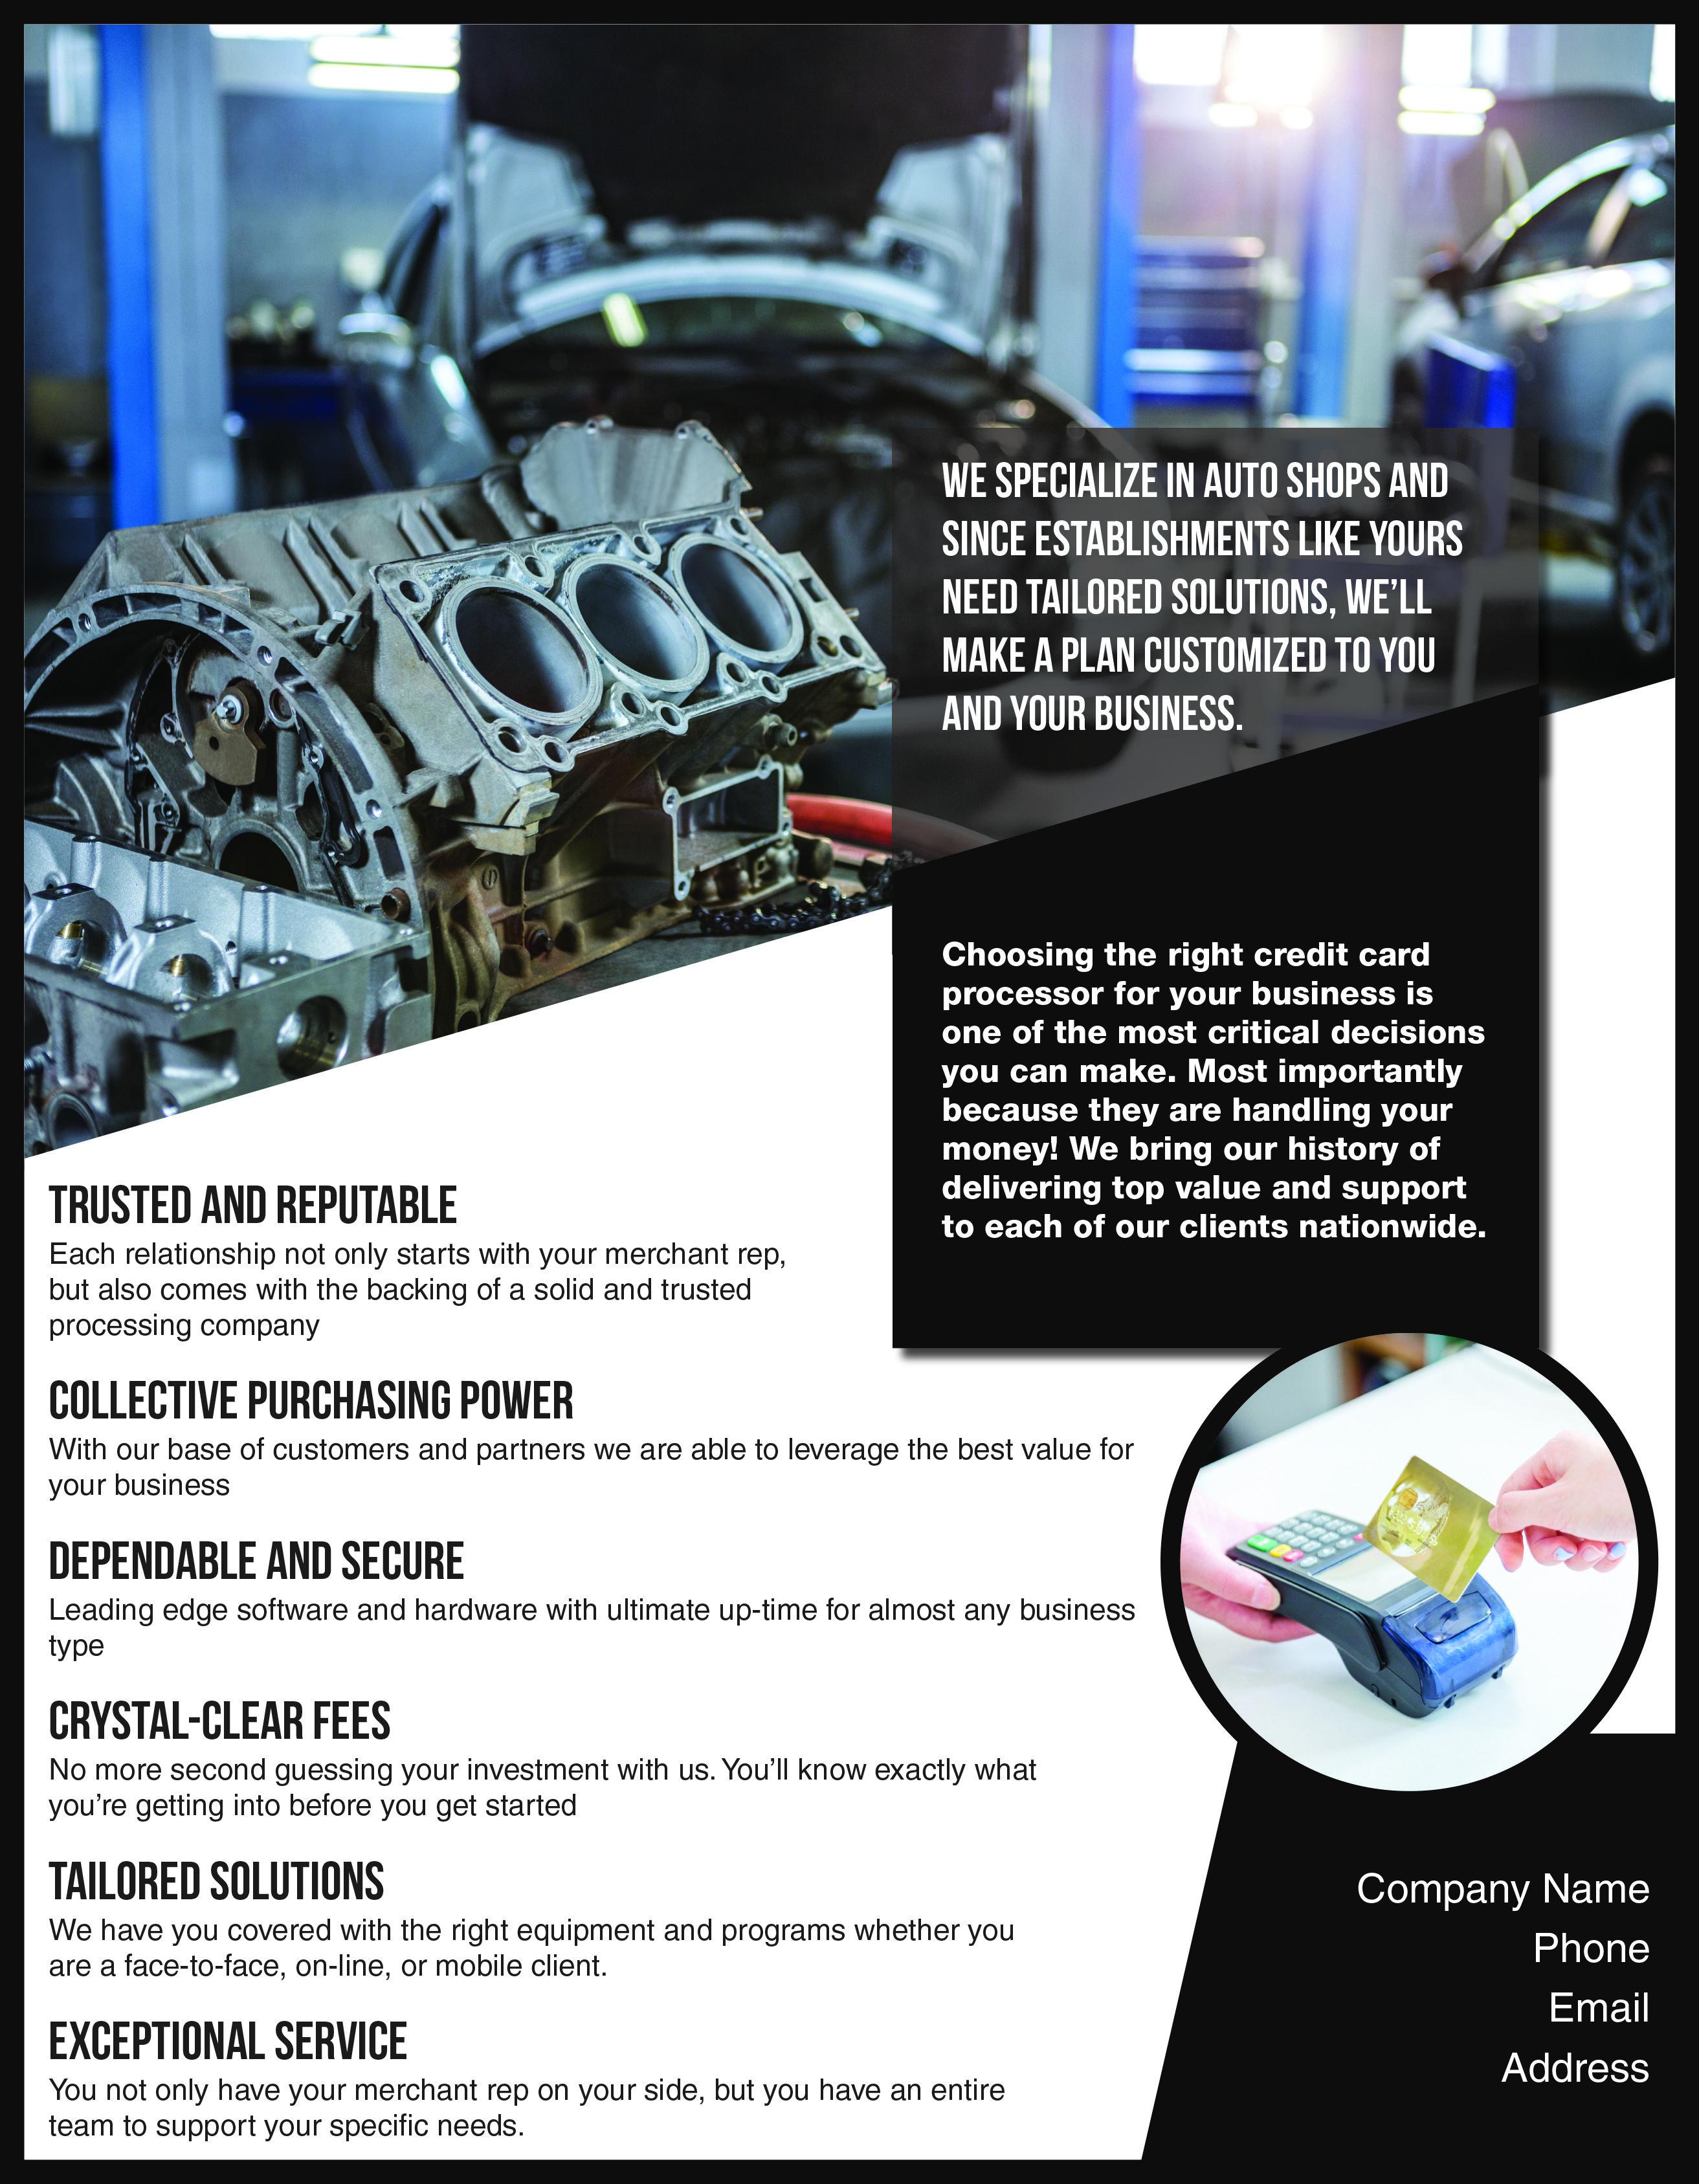 flyer design for auto repair section. Postcard design